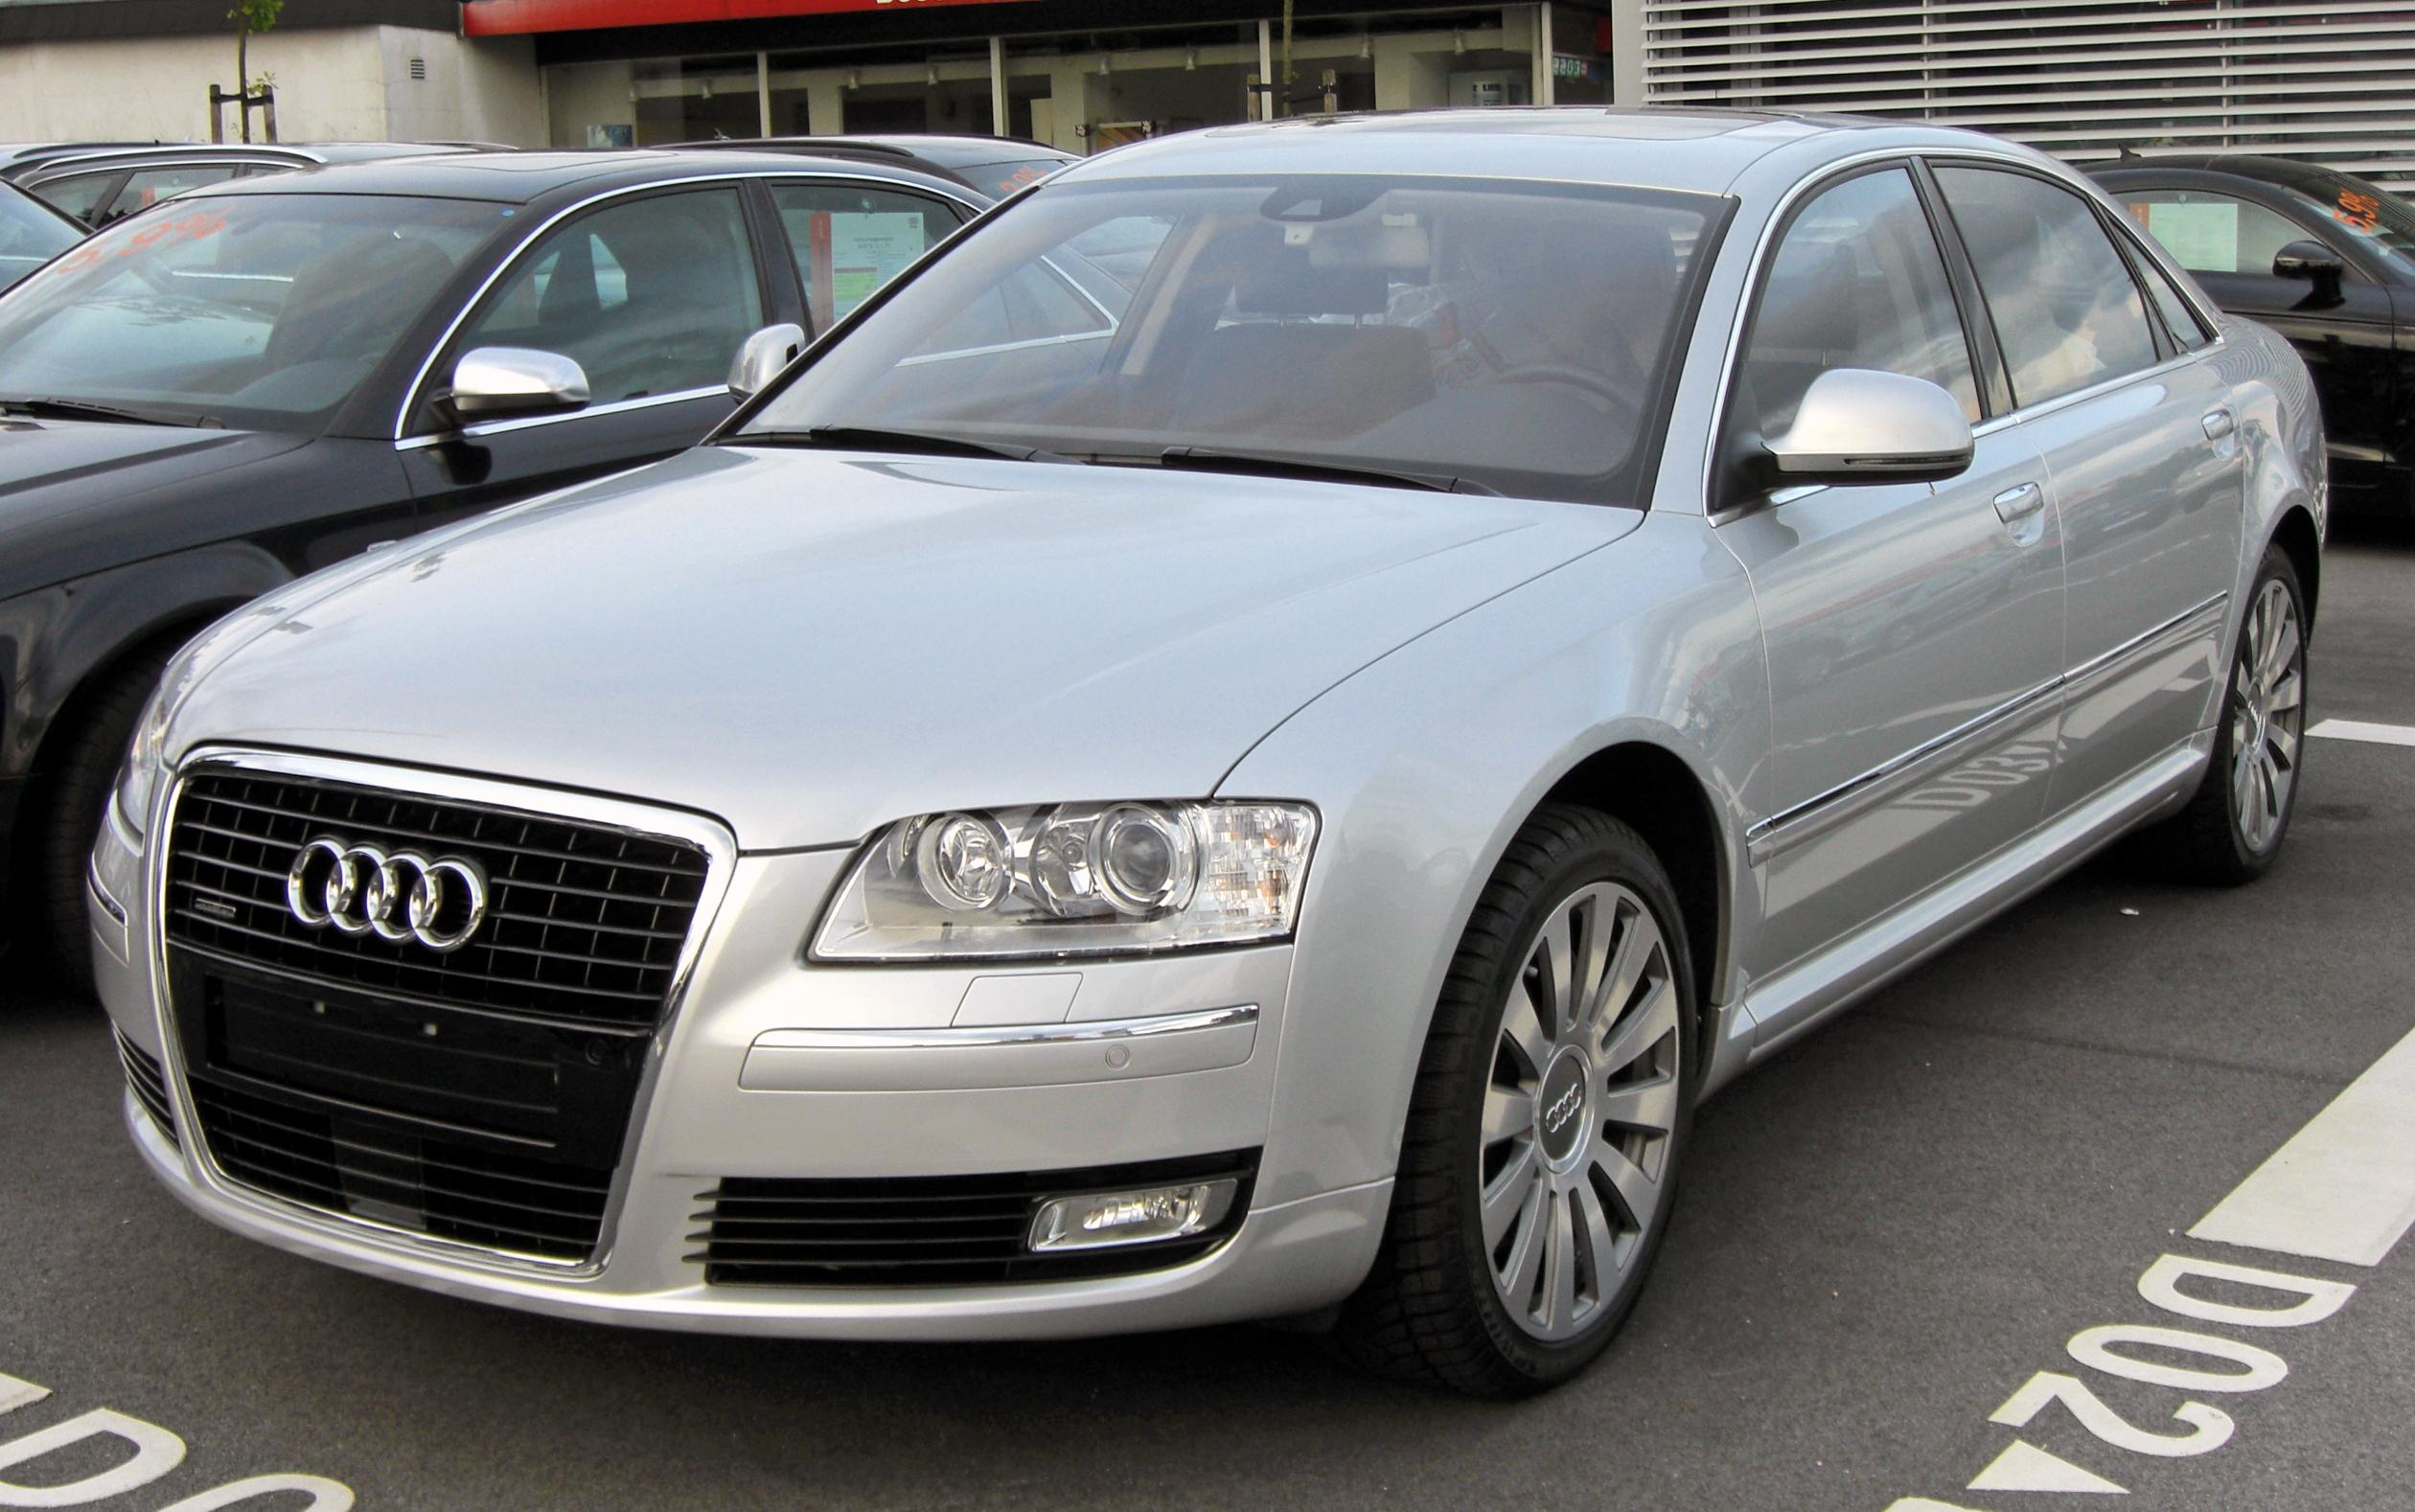 Audi A8 II (D3) Restyling 2 2007 - 2010 Sedan #4